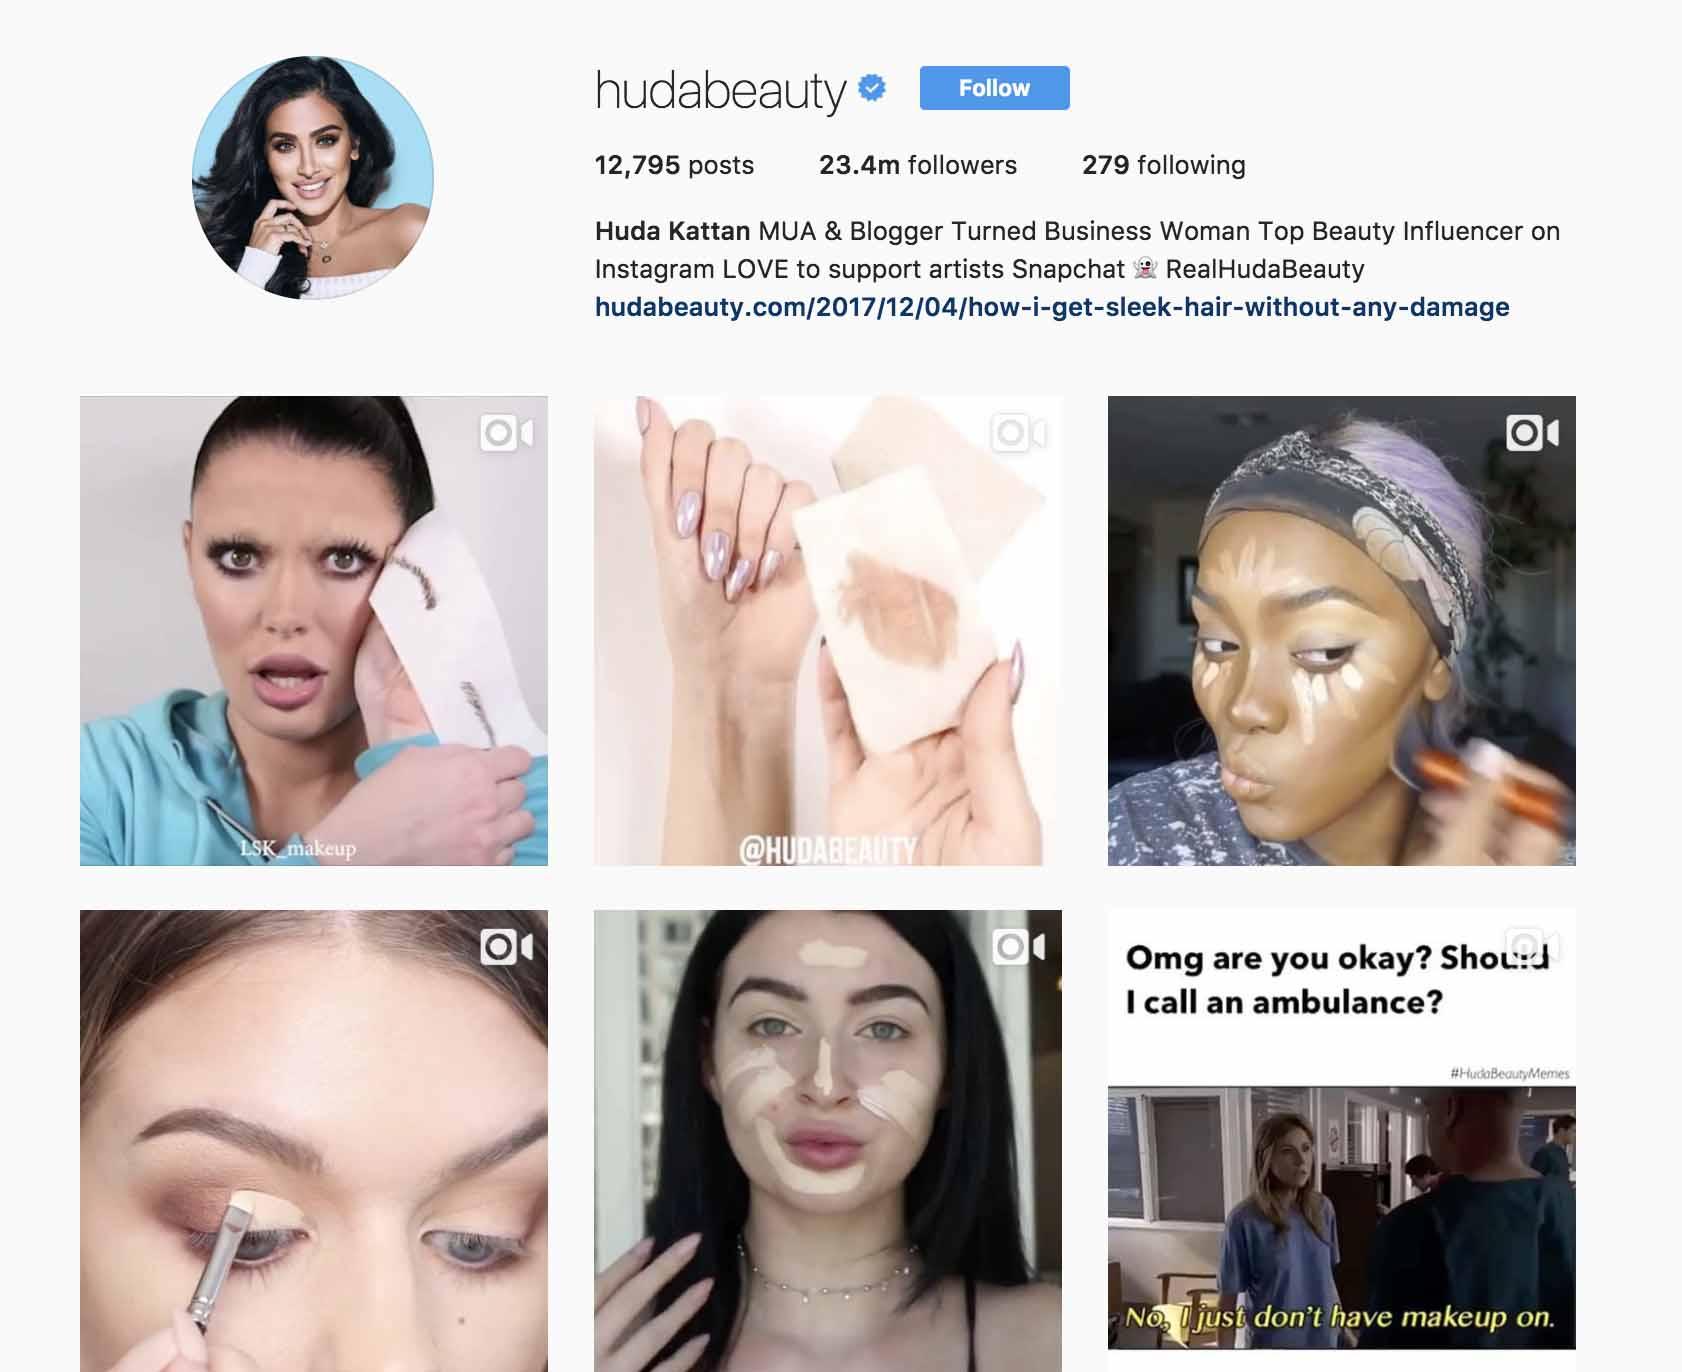 huda-beauty-best-brands-on-instagram